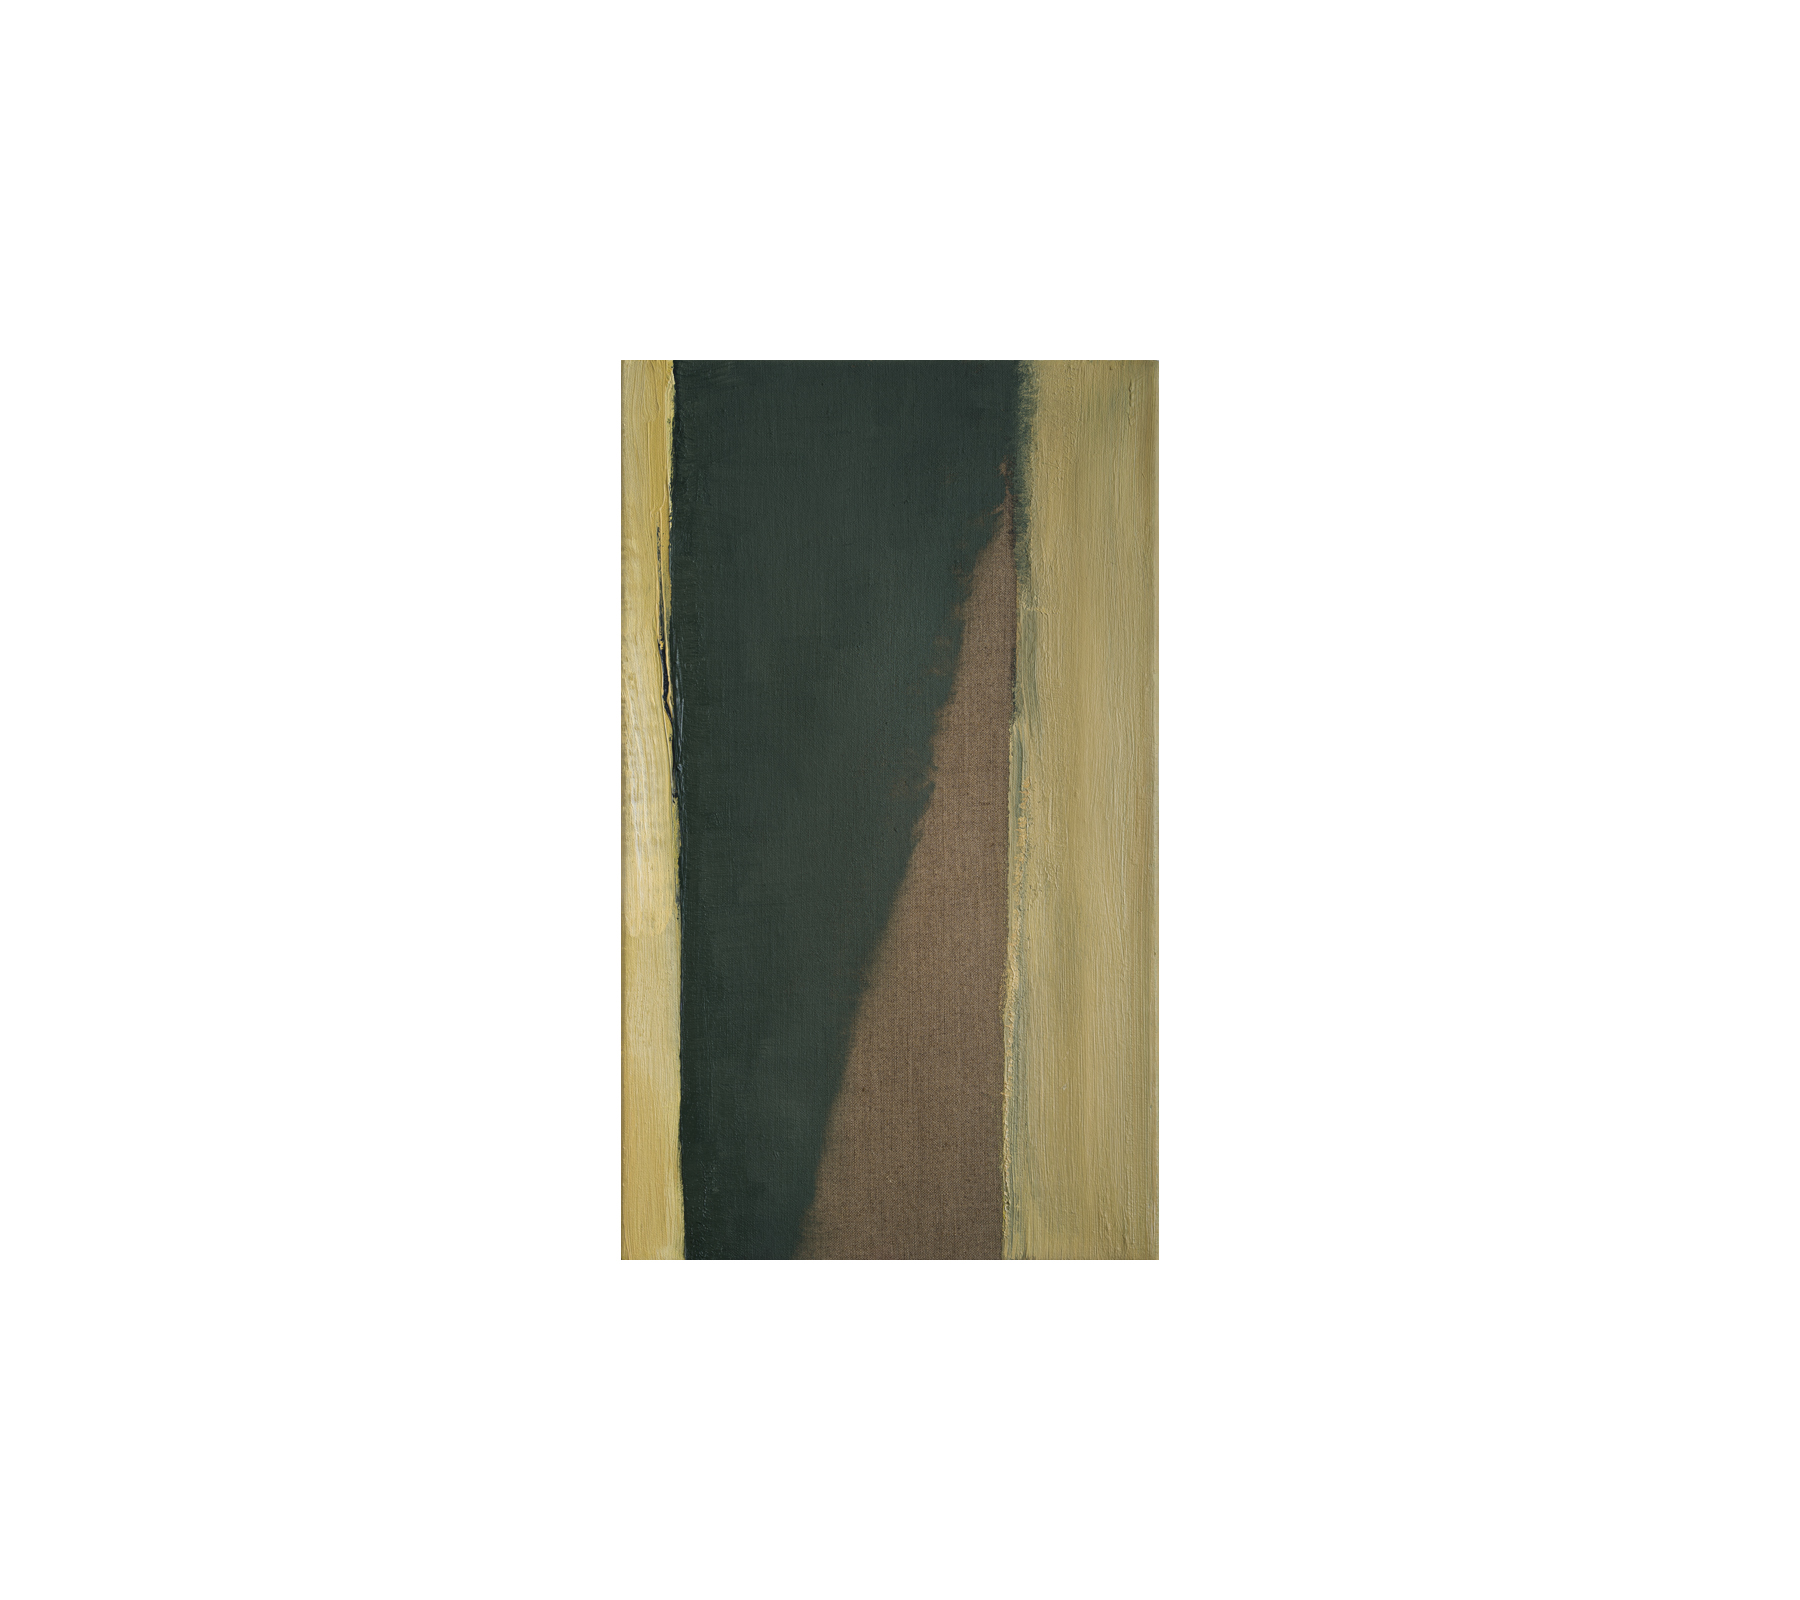 Untitled 2019 50x30cm